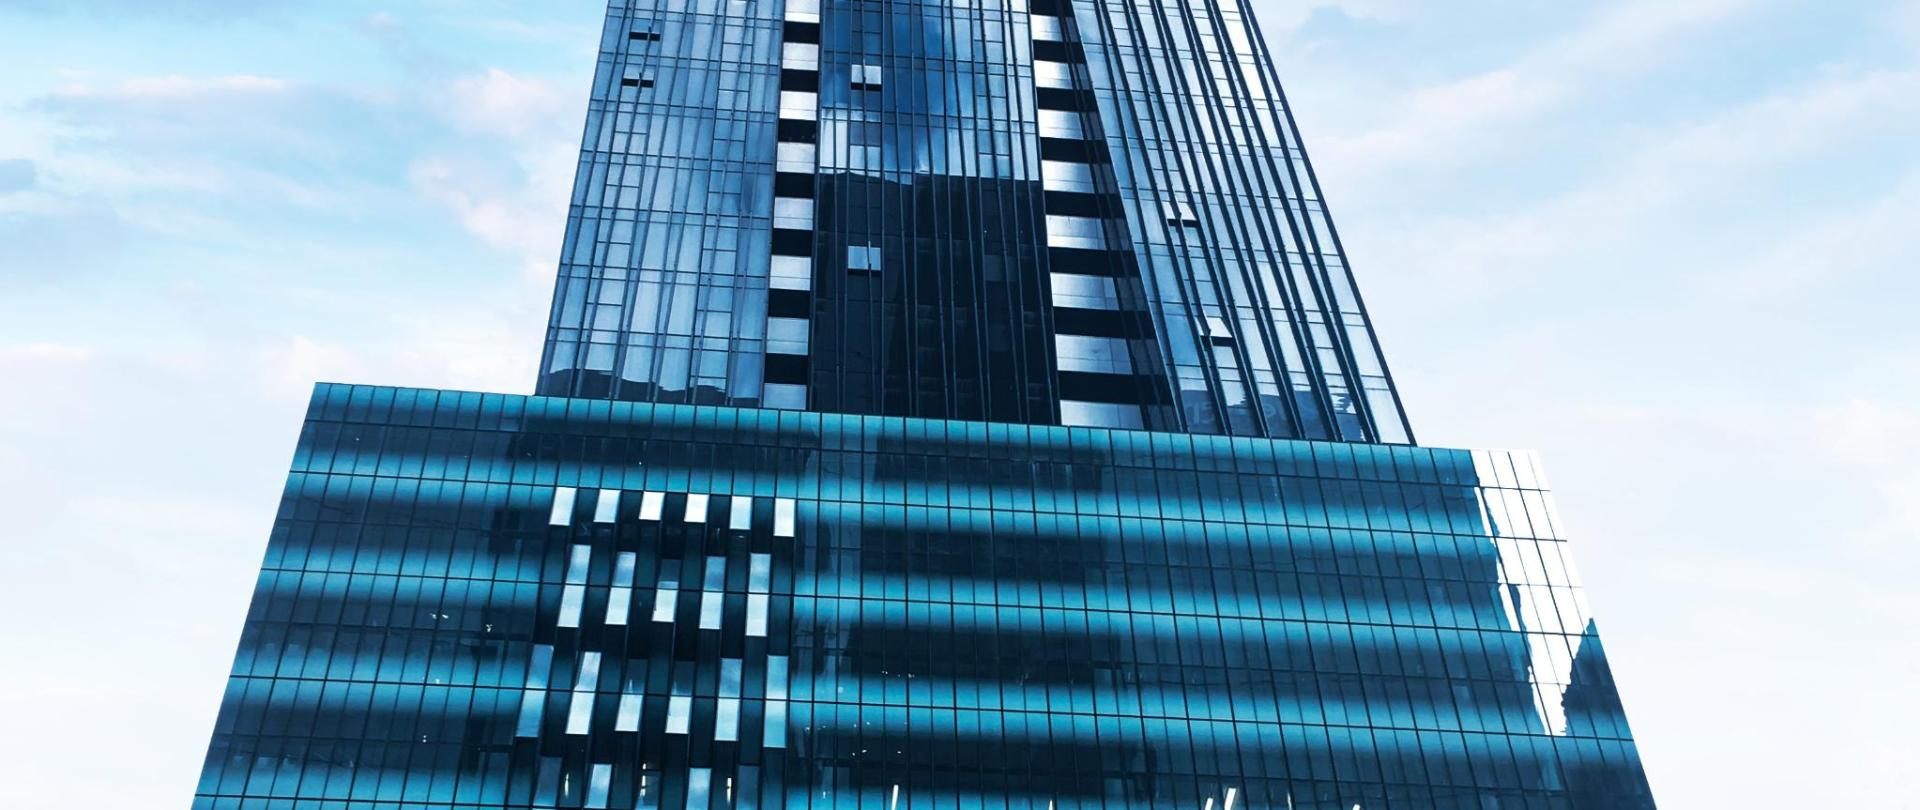 Cover photo - 大楼外观.JPG